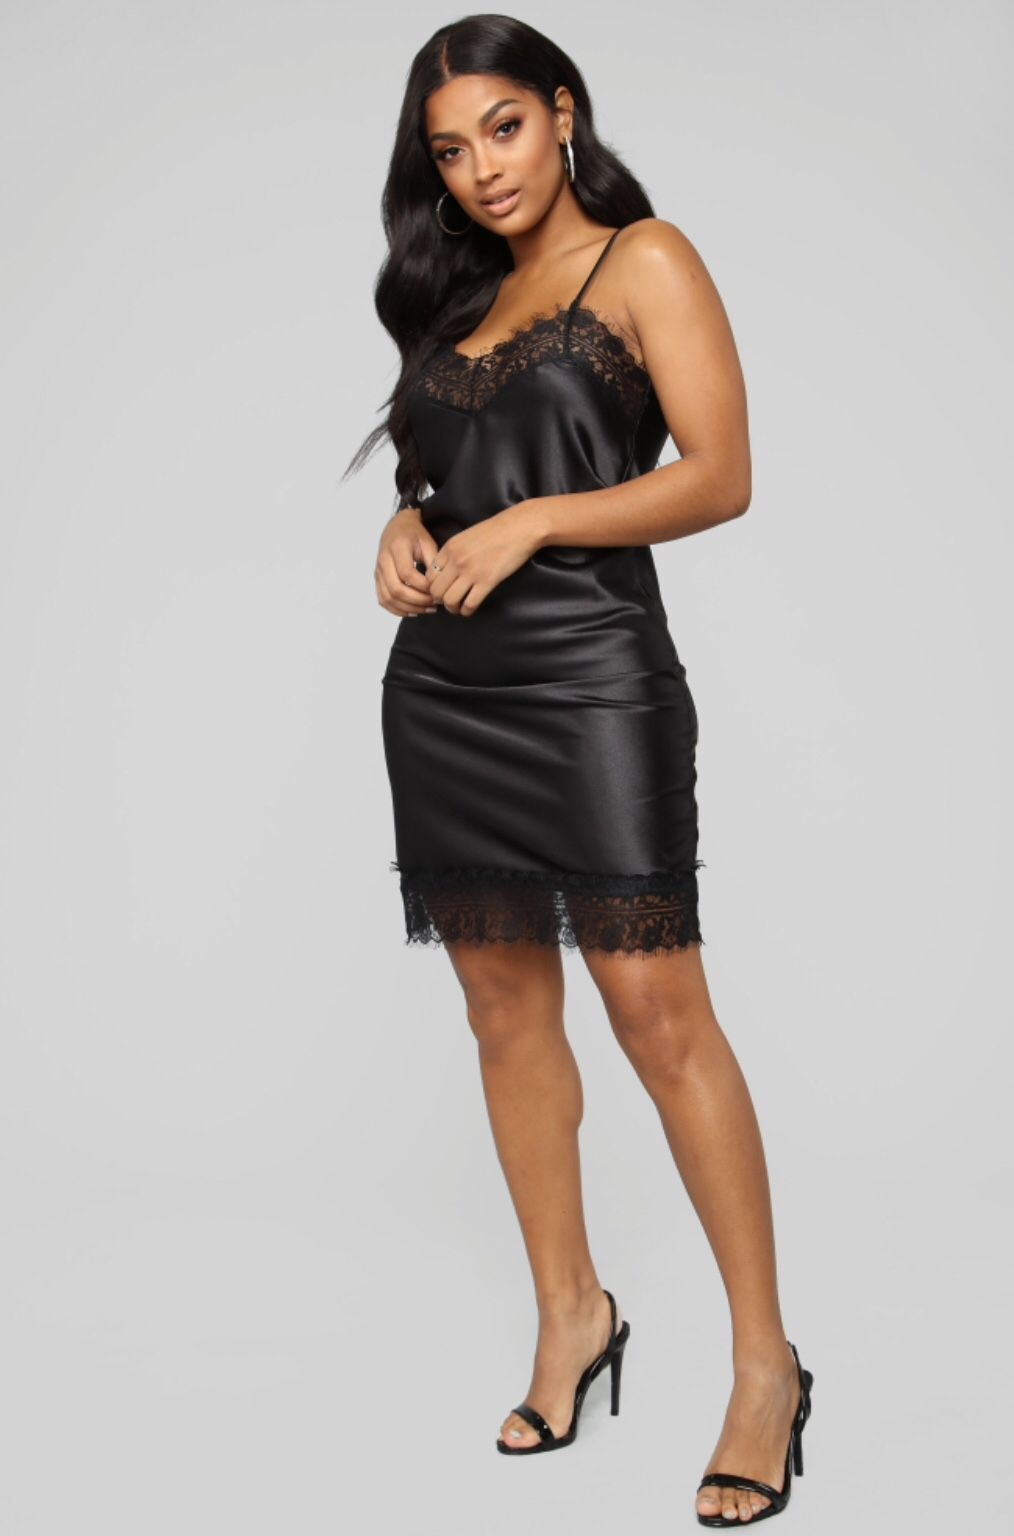 She S A Pleaser Satin Slip Dress Black Satin Slip Dress Satin Slip Slip Dress [ 1536 x 1014 Pixel ]